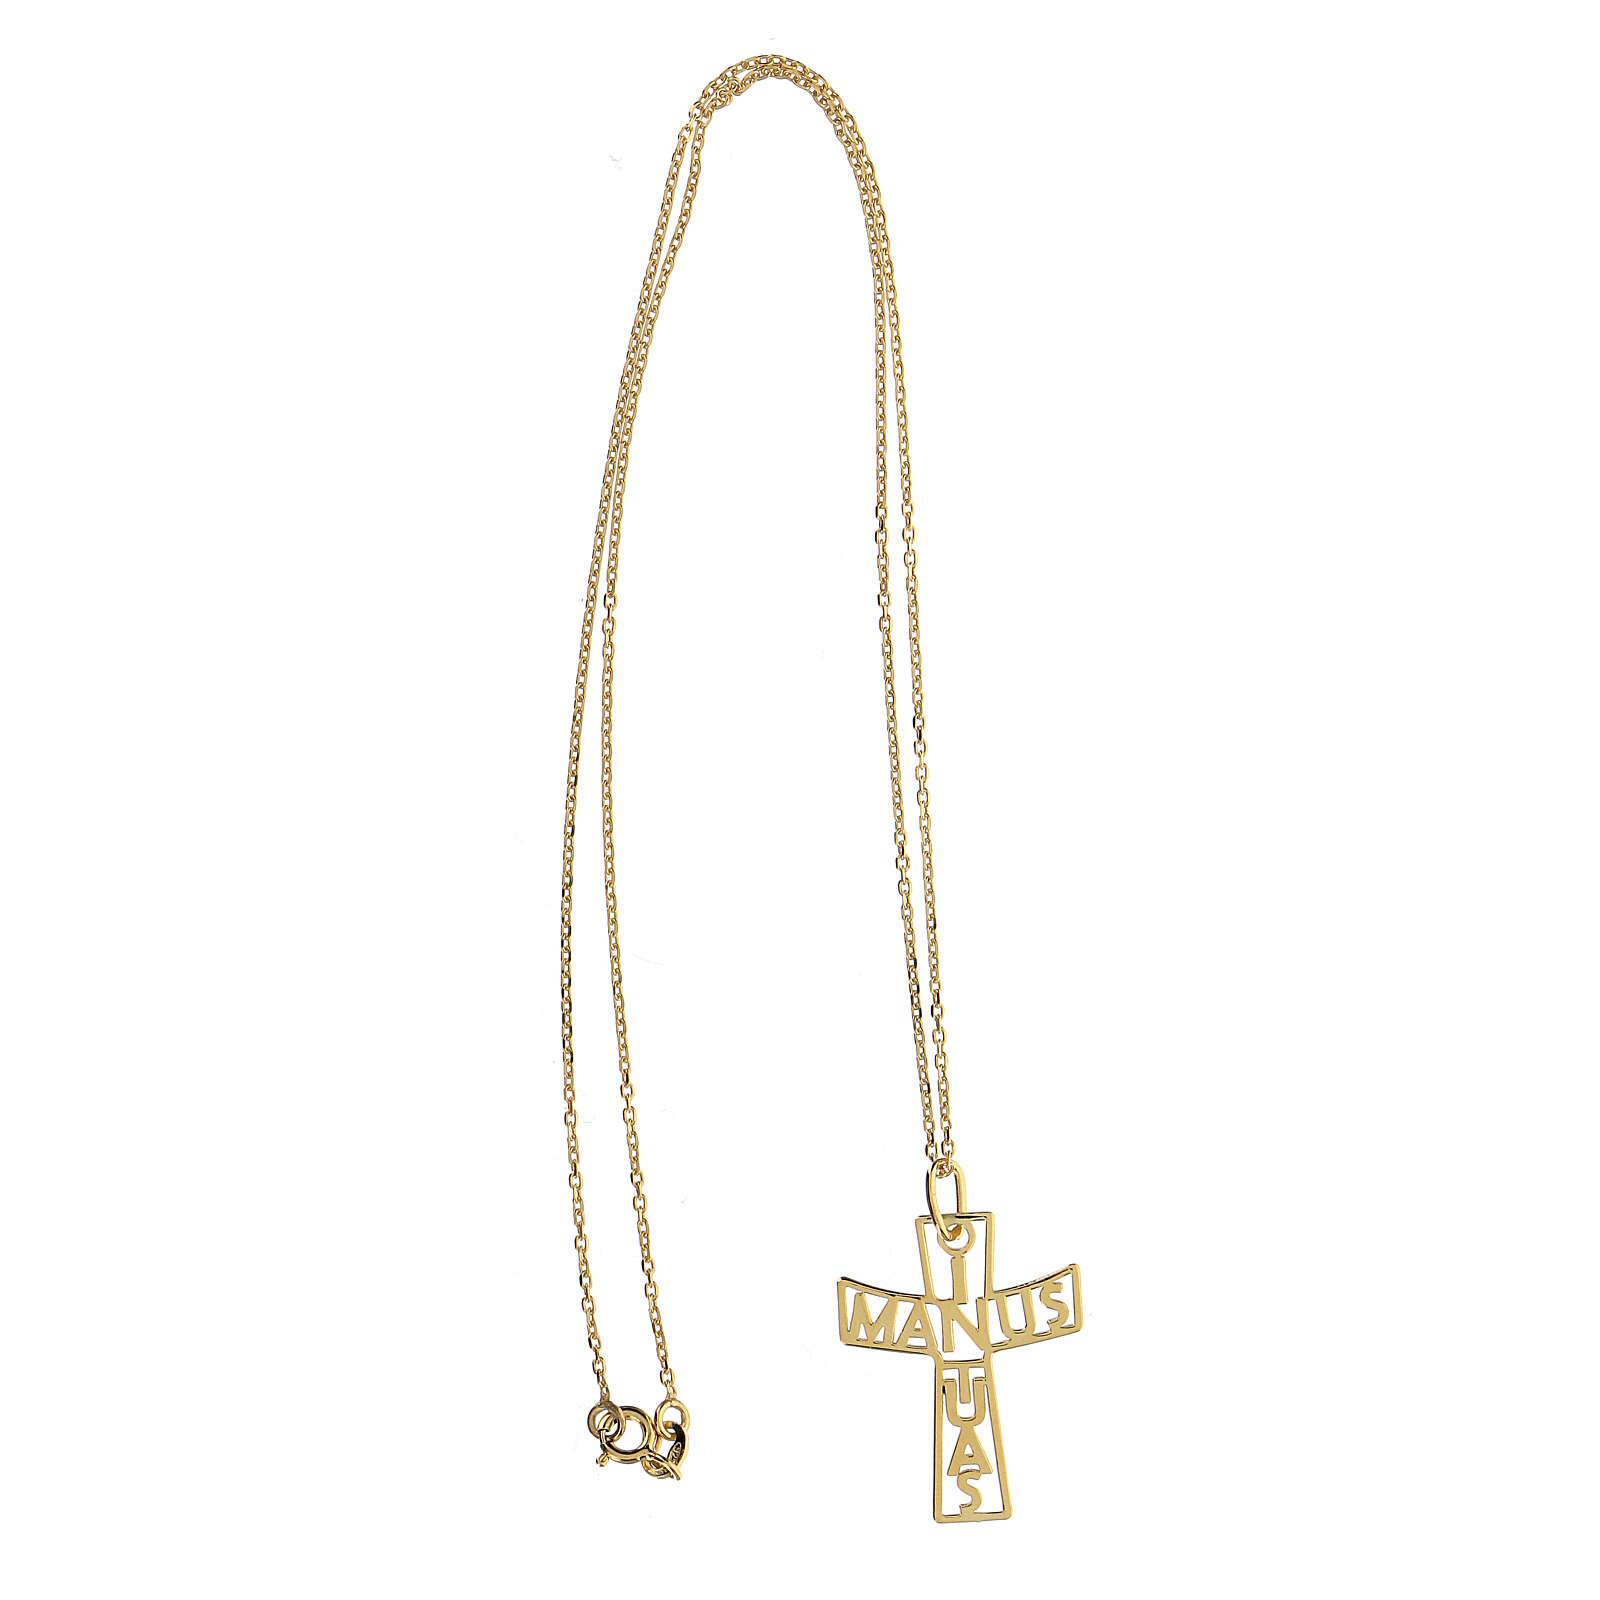 Croce grande traforata In Manus Tuas argento 925 dorato 4